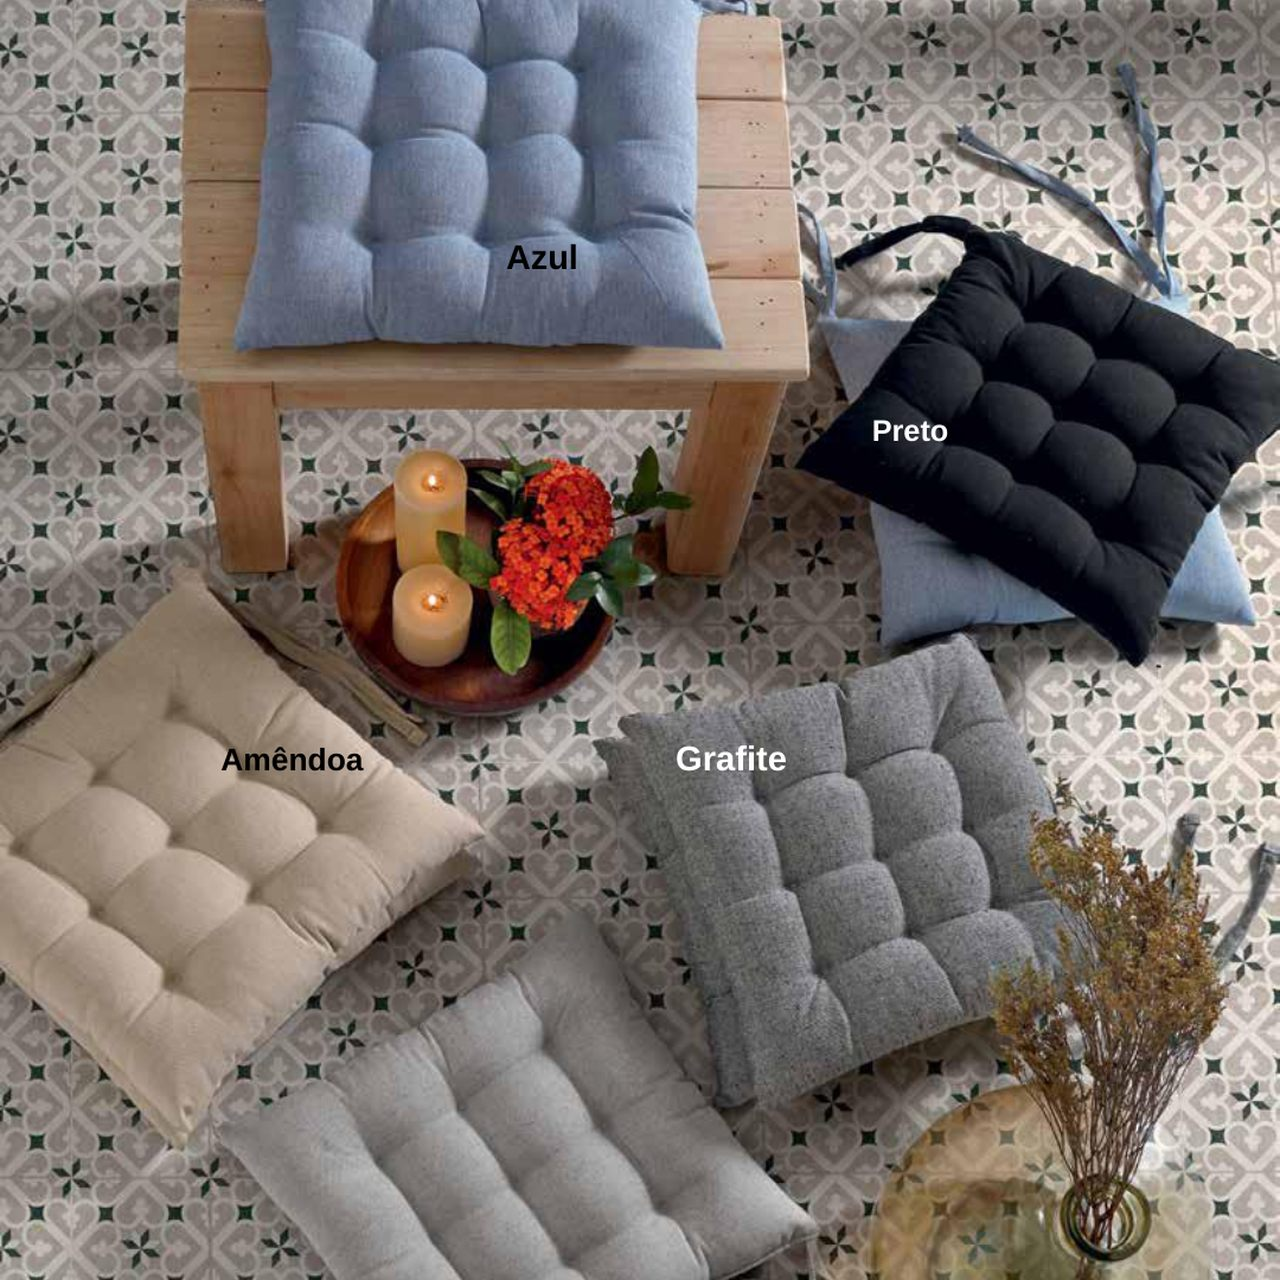 Almofada Futton para cadeira 45x45cm - Preto